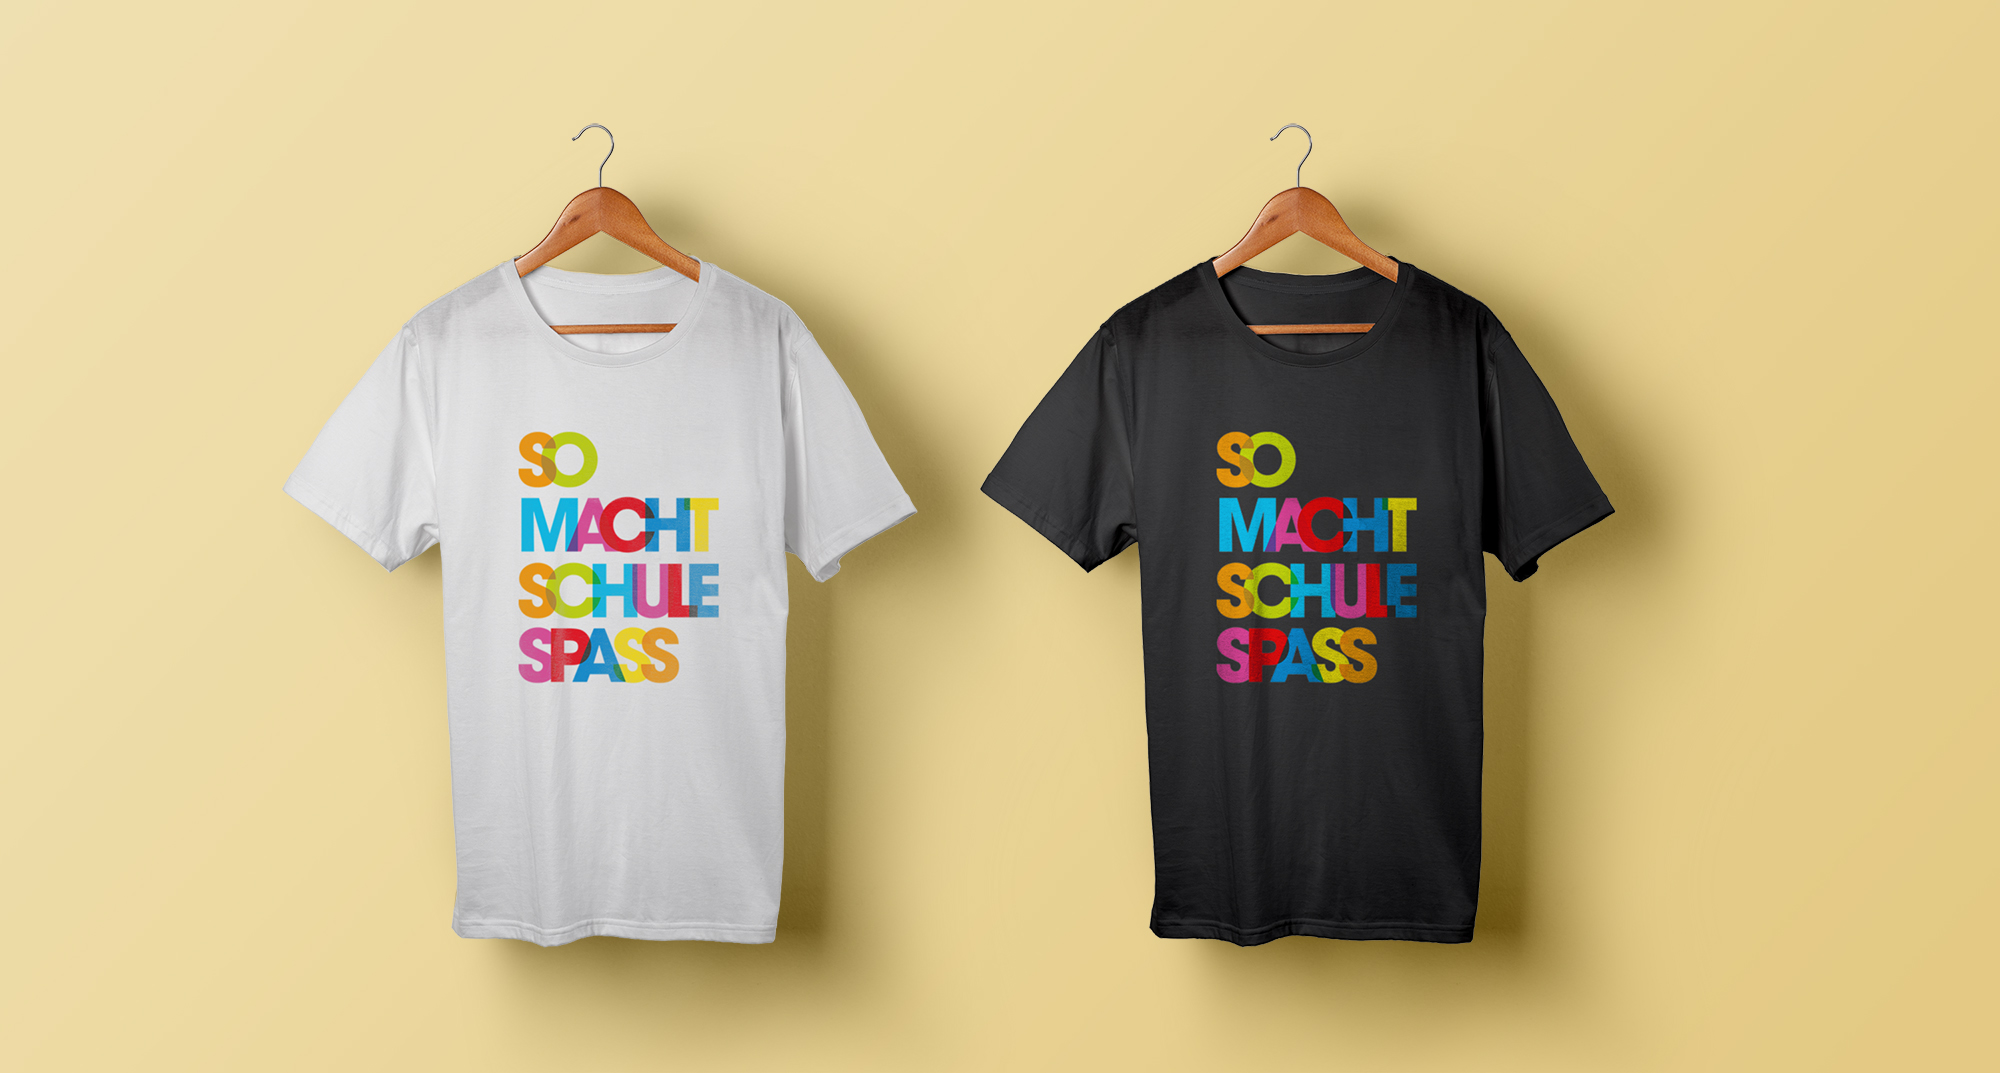 libro_schule_shirt_beide